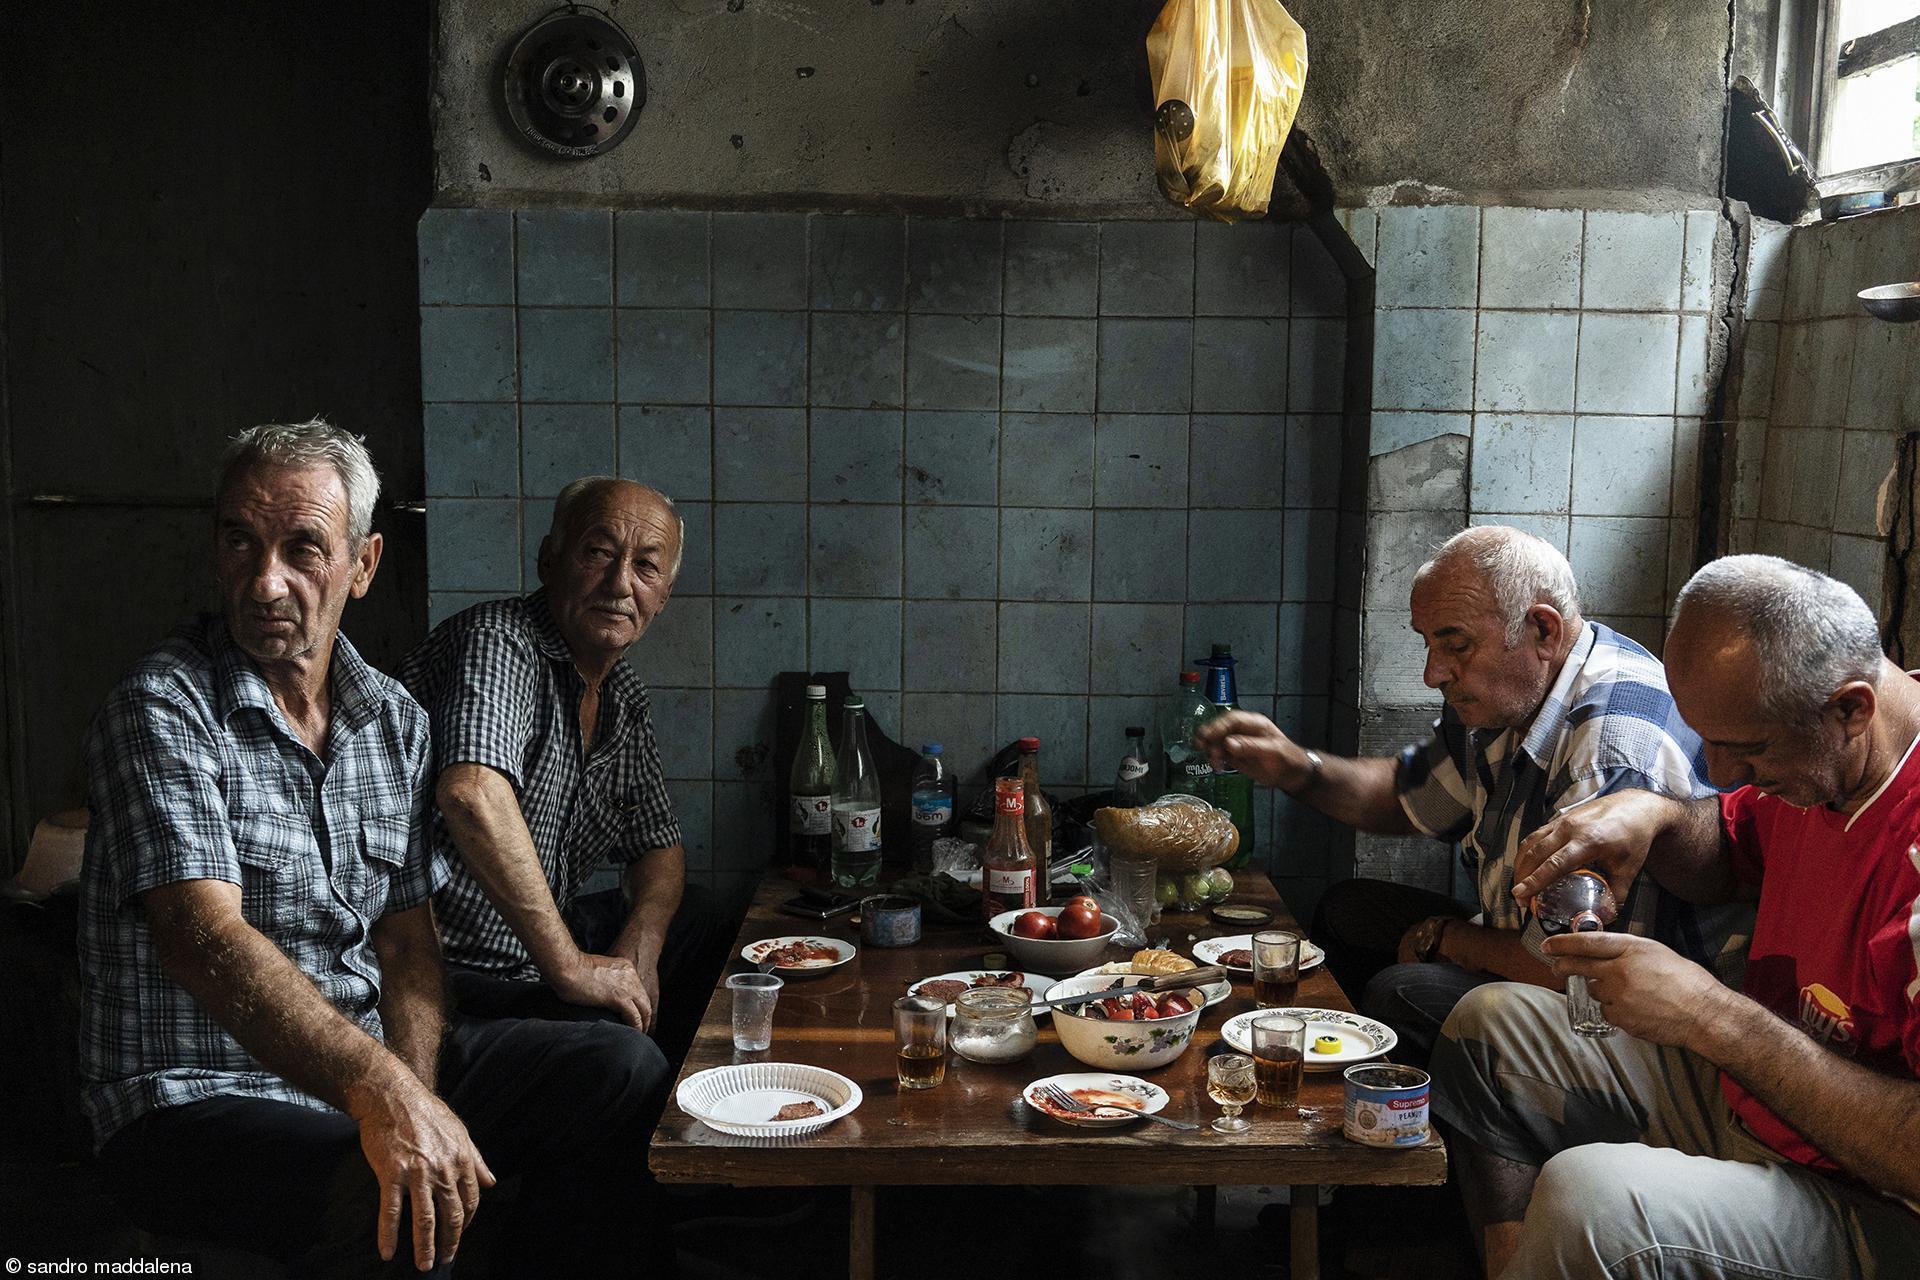 Politics - Sandro Maddalena - Old friends - Lo Res